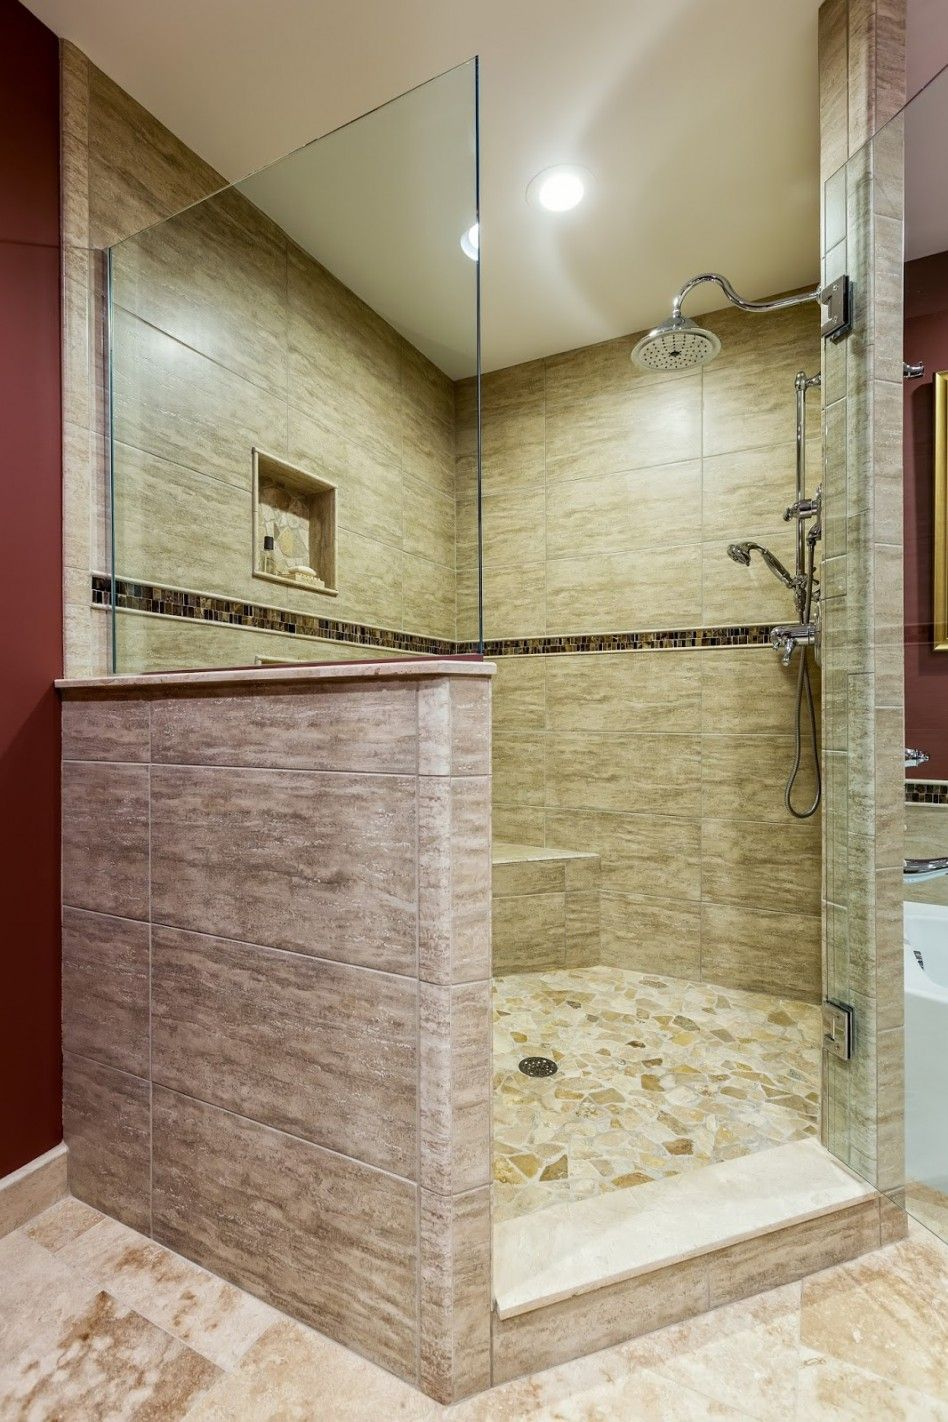 Glass Mosaic Tile Bathroom Ideas With Cream Stone Bathroom Flooring ...